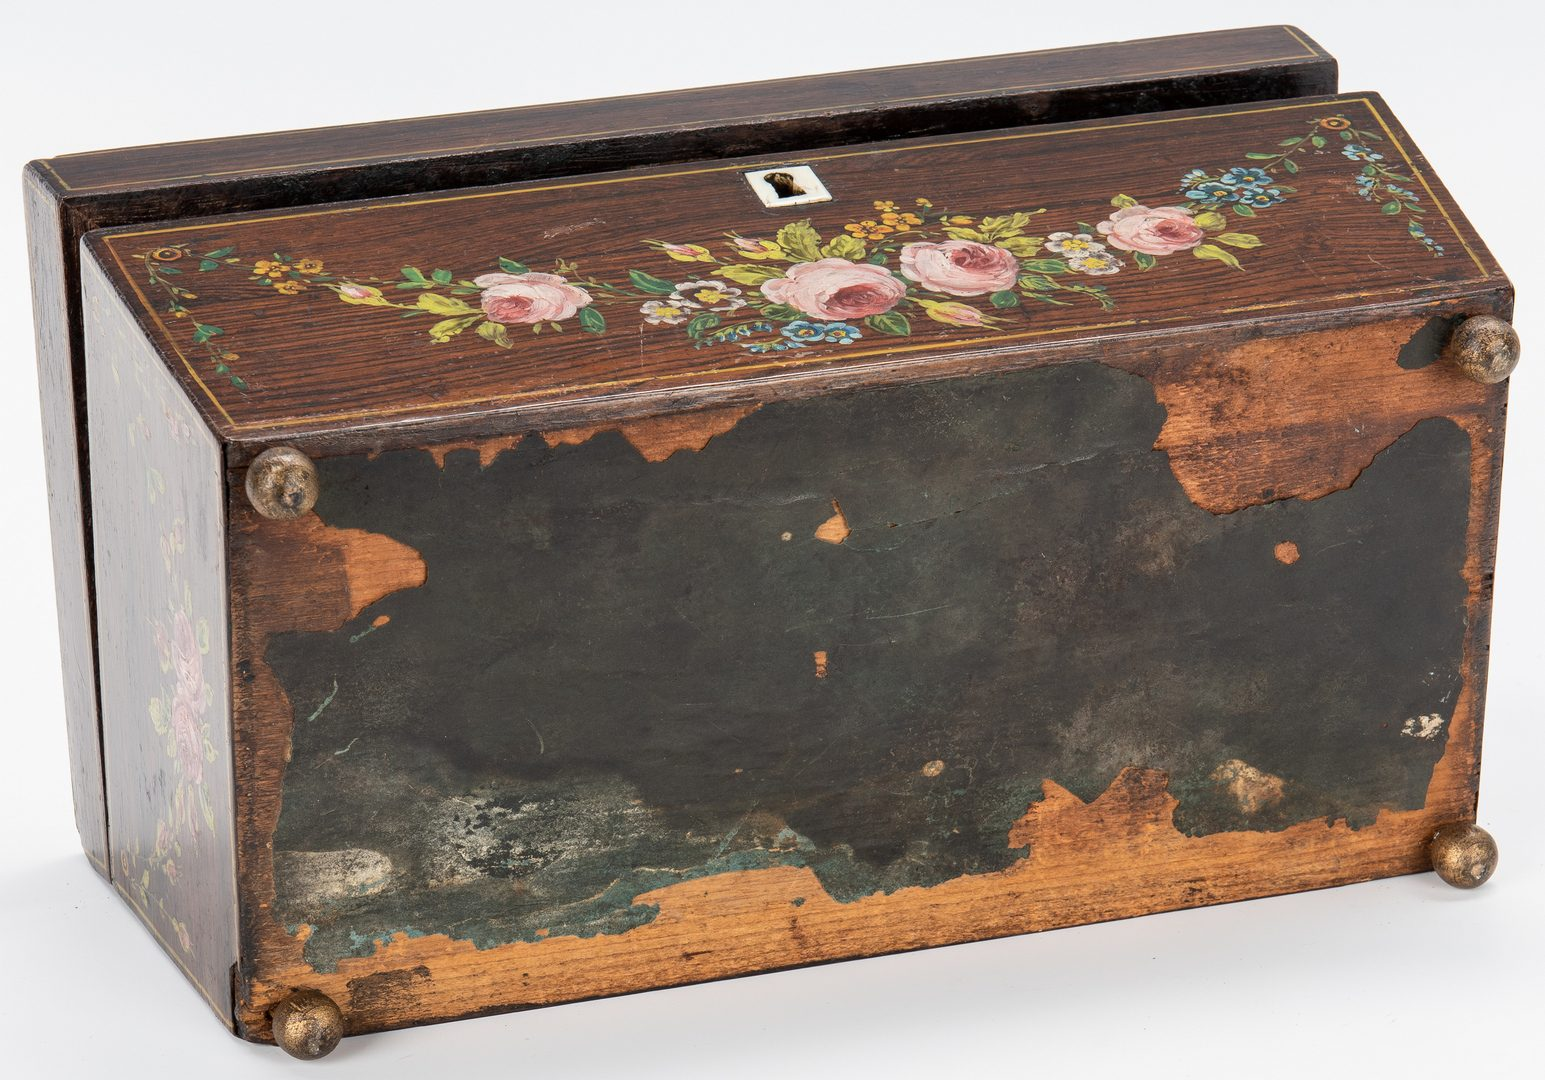 Lot 52: Pr. Imari Candleholders & Regency Tea Caddy